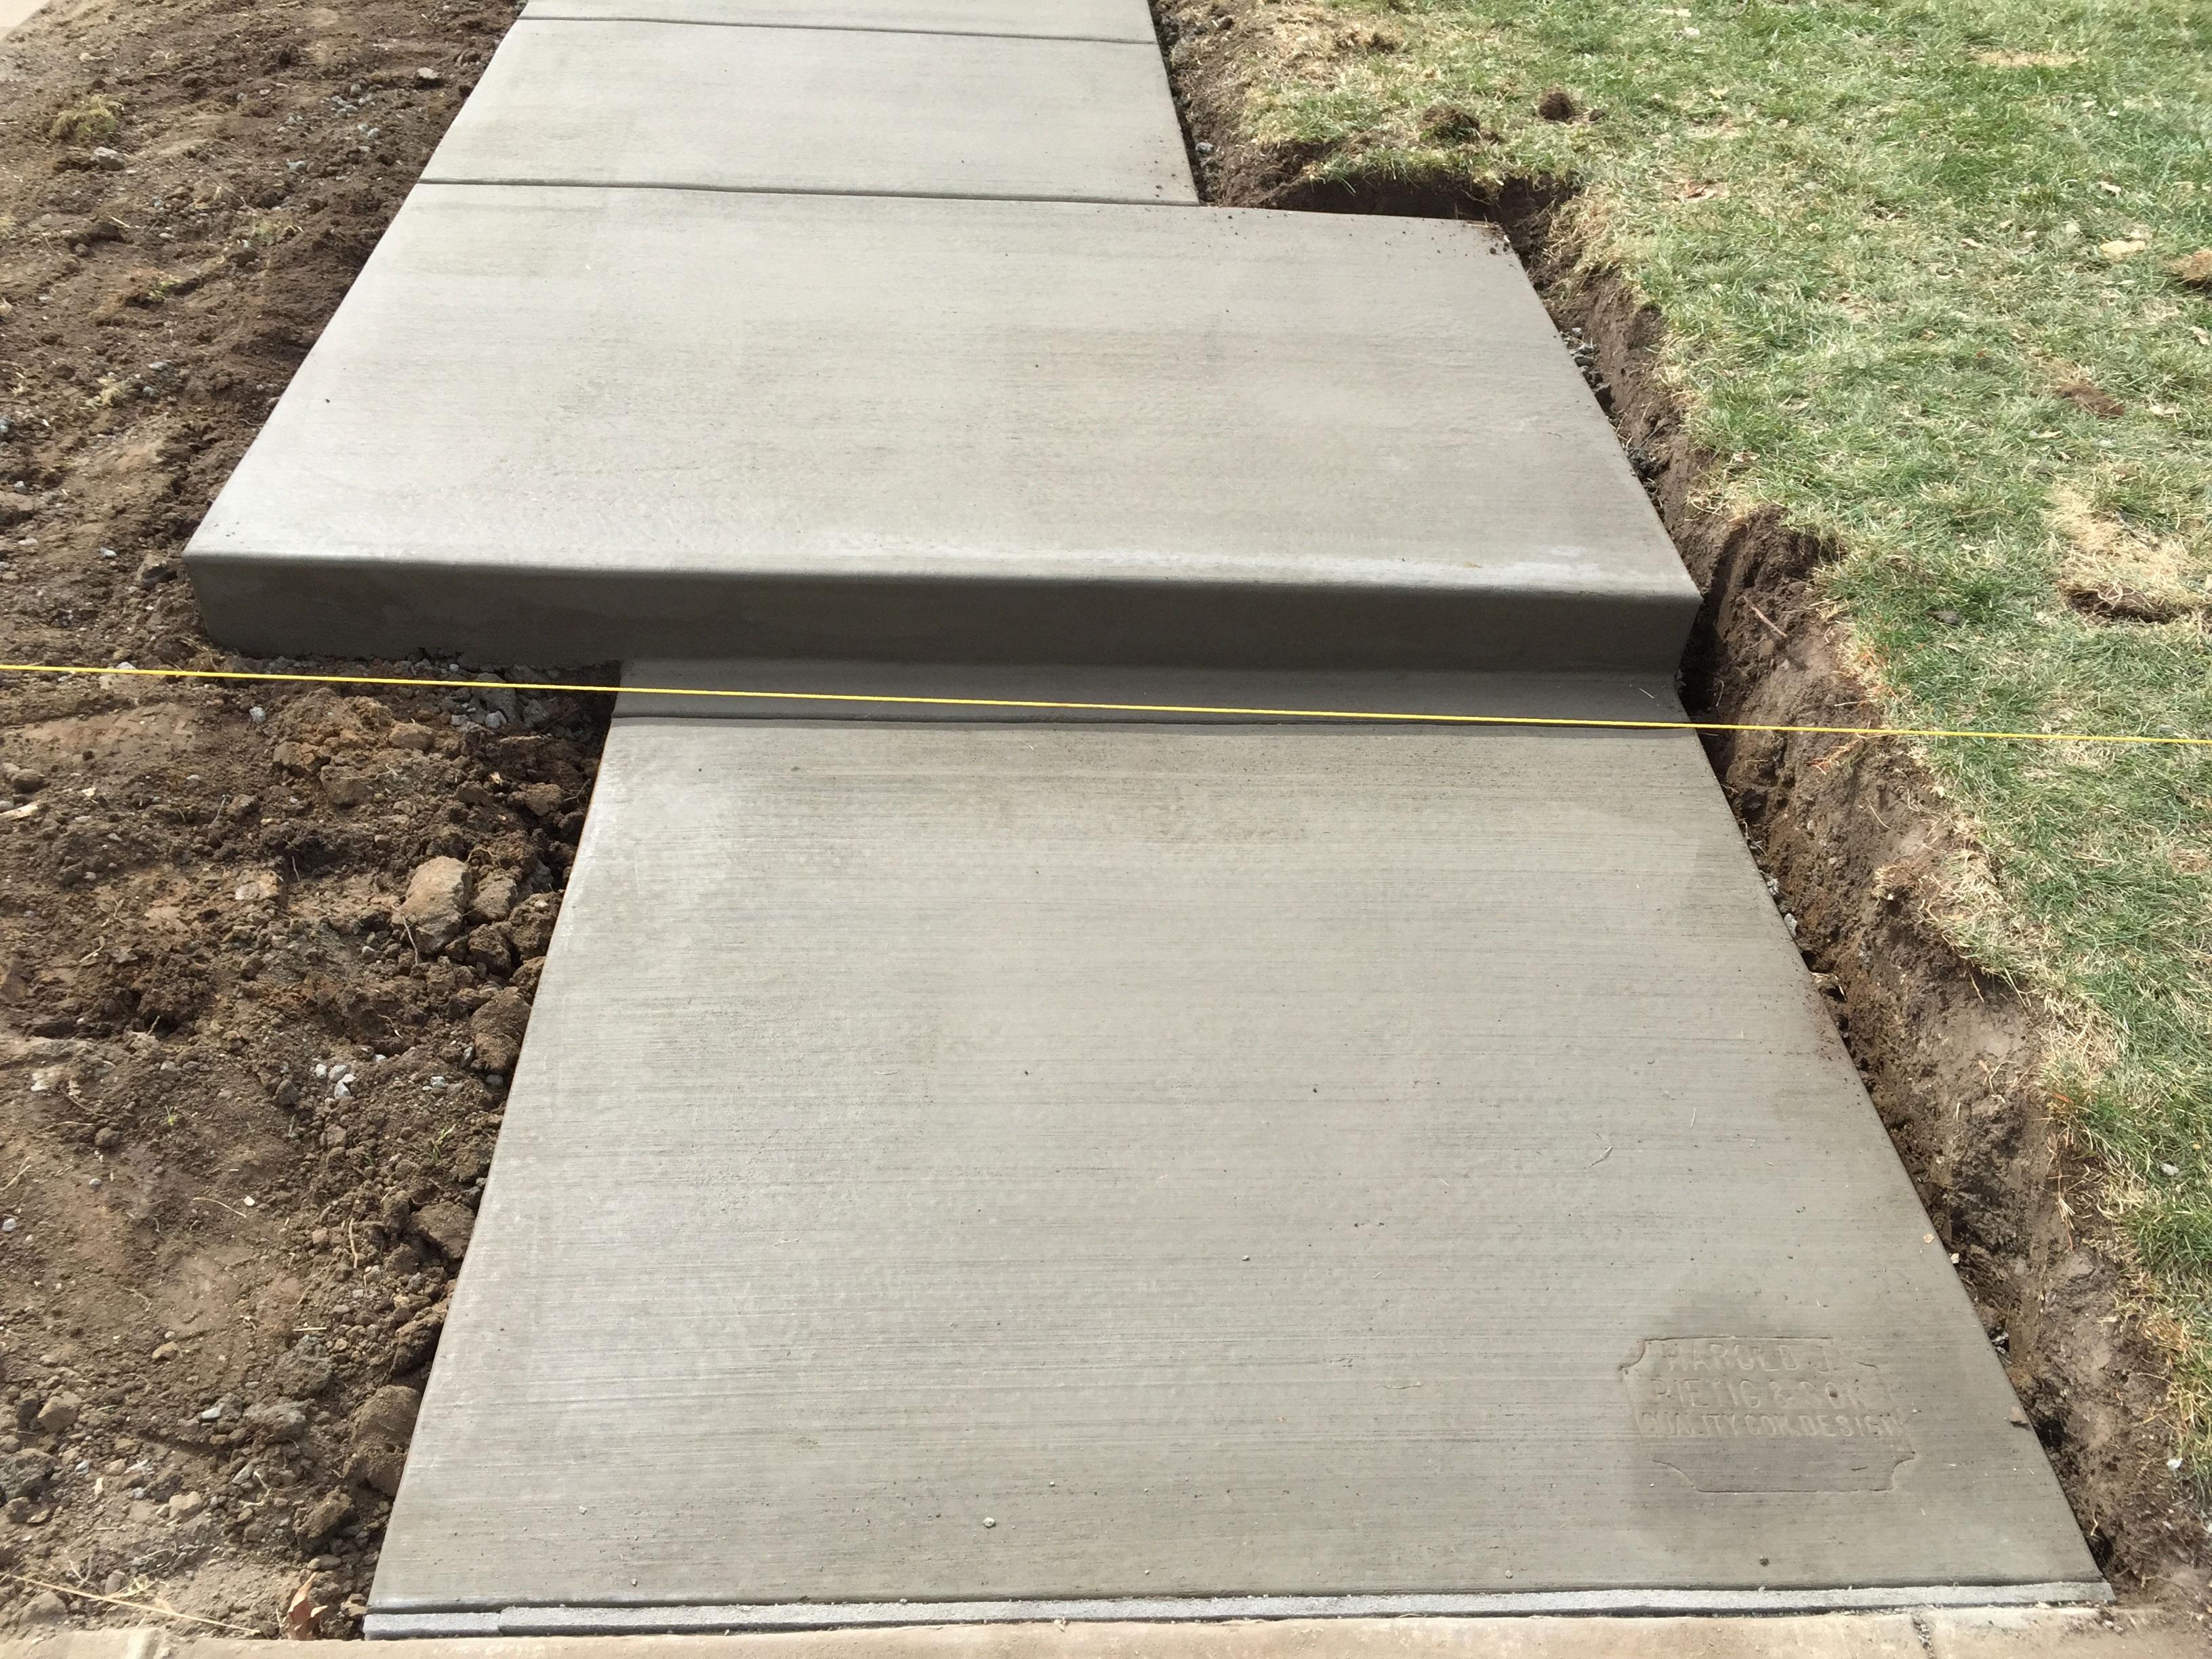 Concrete Stairs and Walkway - Harold J. Pietig & Sons, Inc.